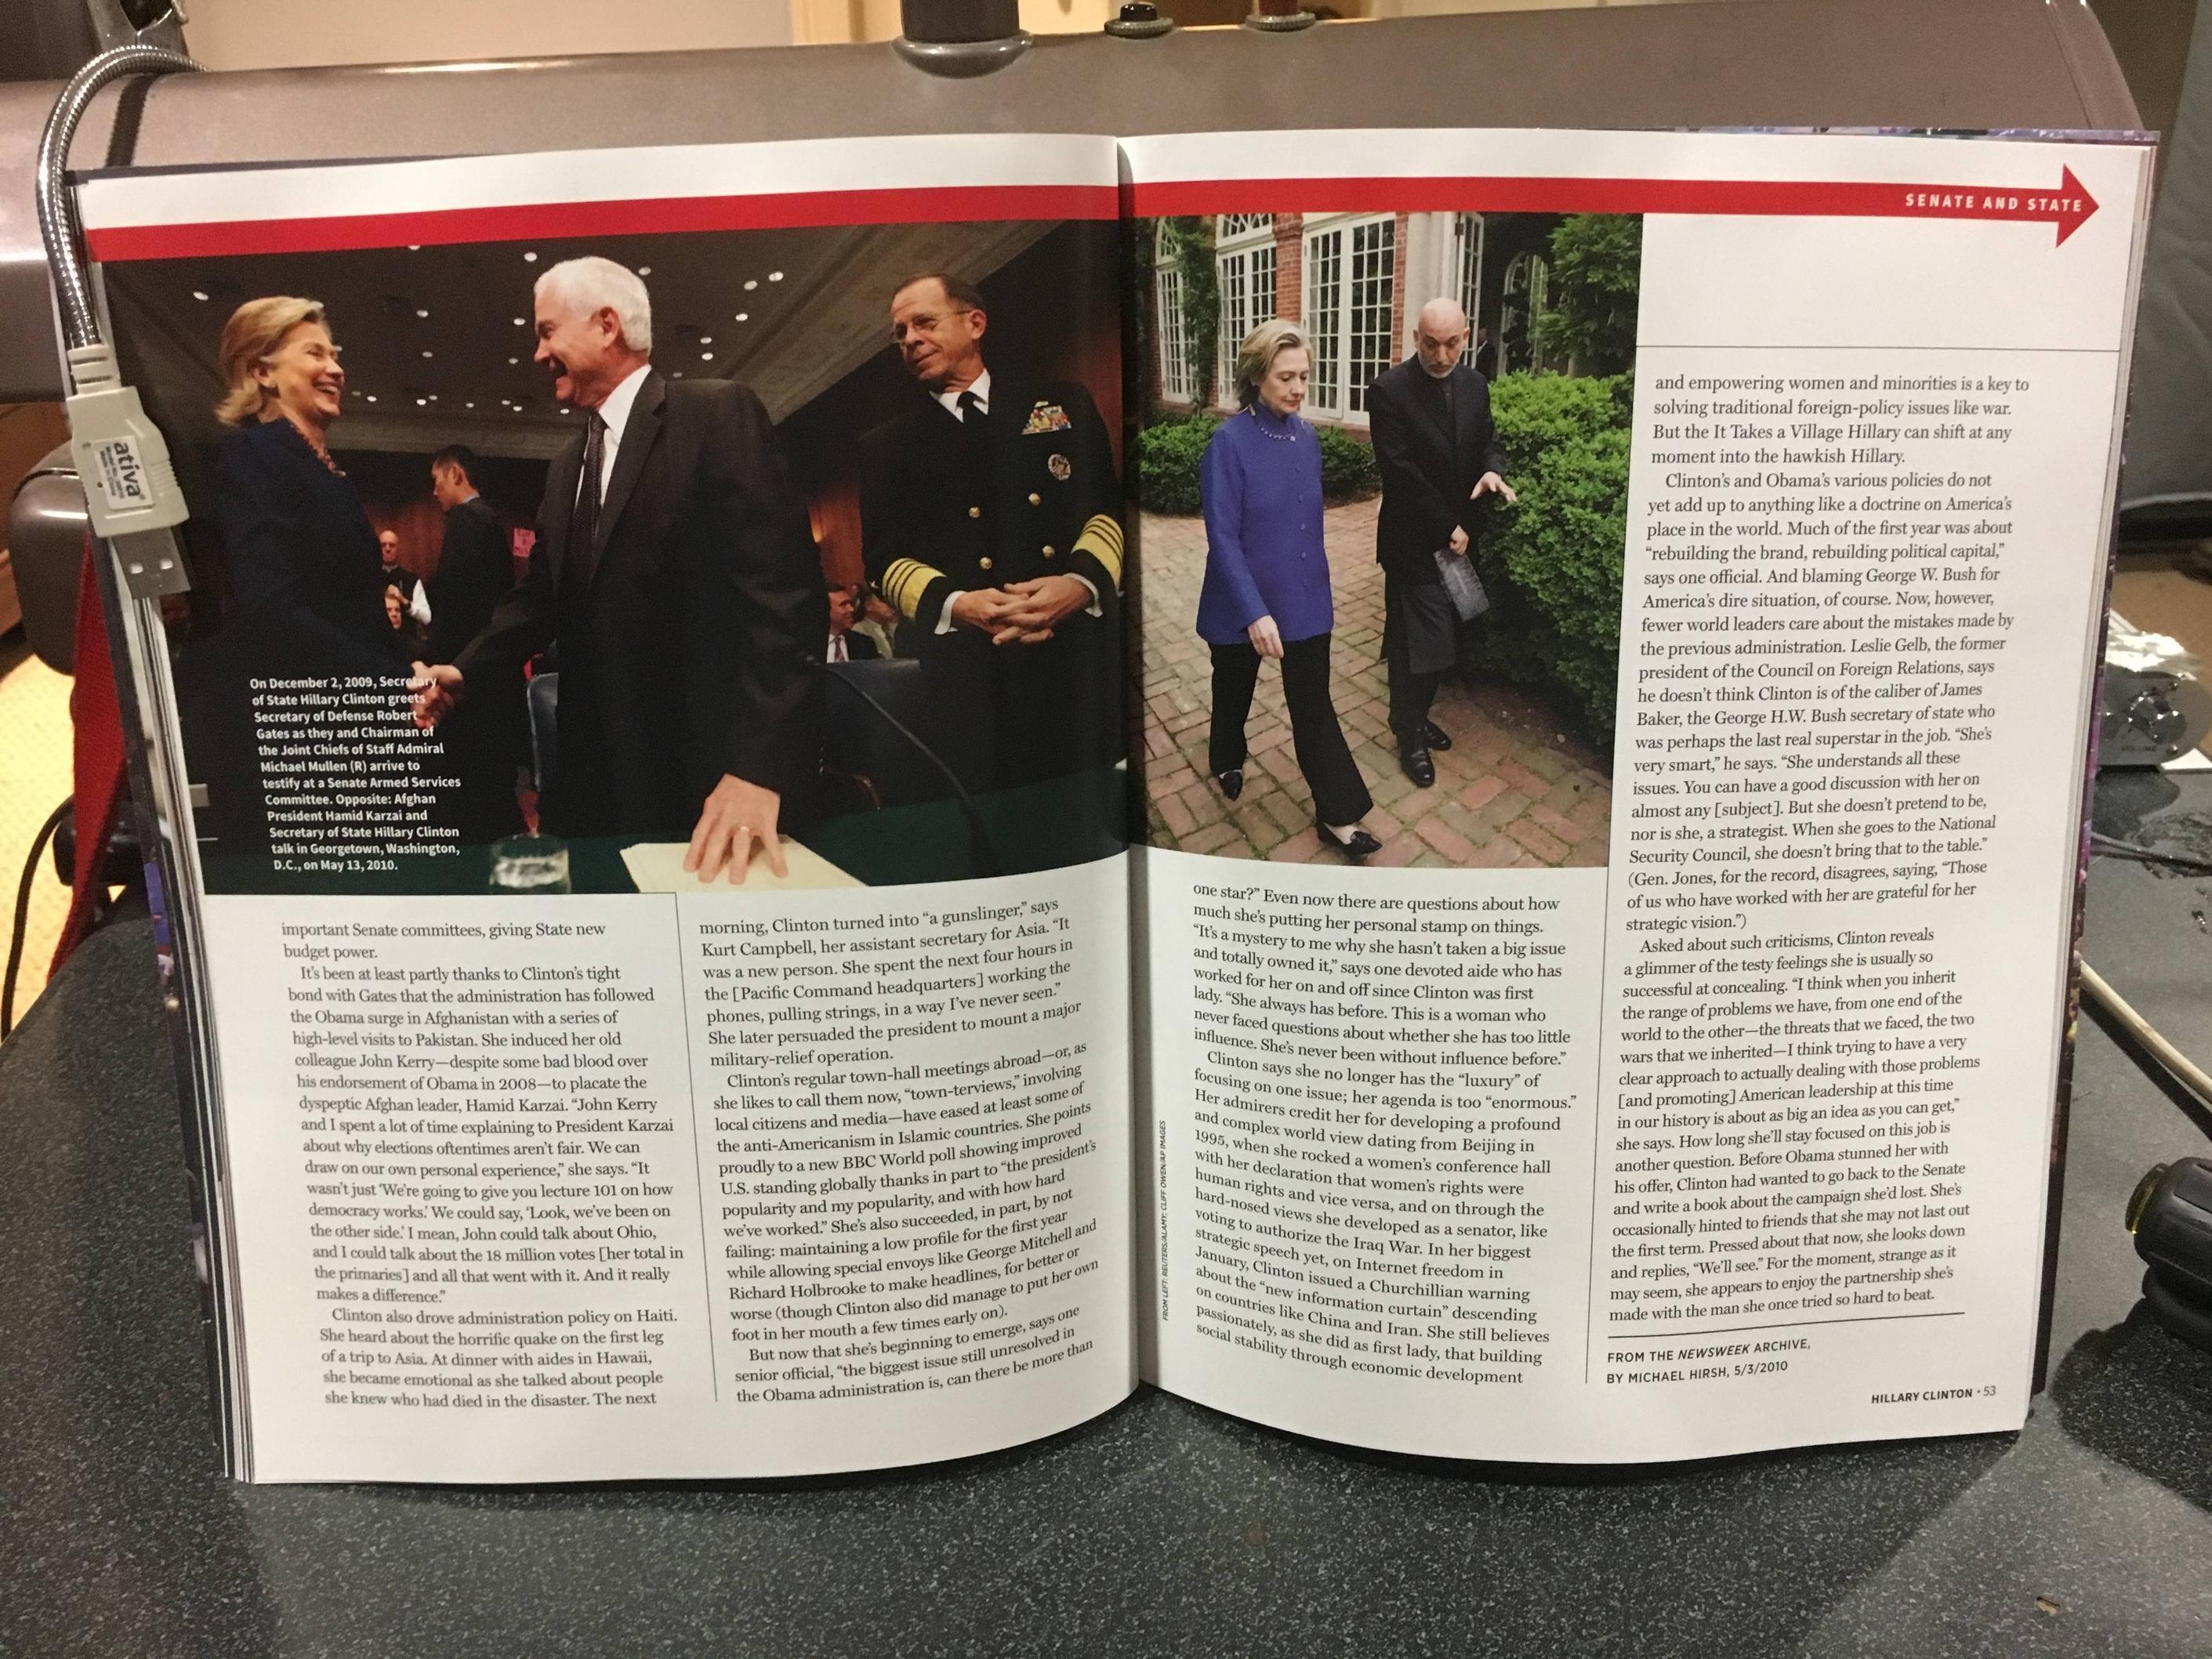 newsweek-madame-hillary-clinton-page-27